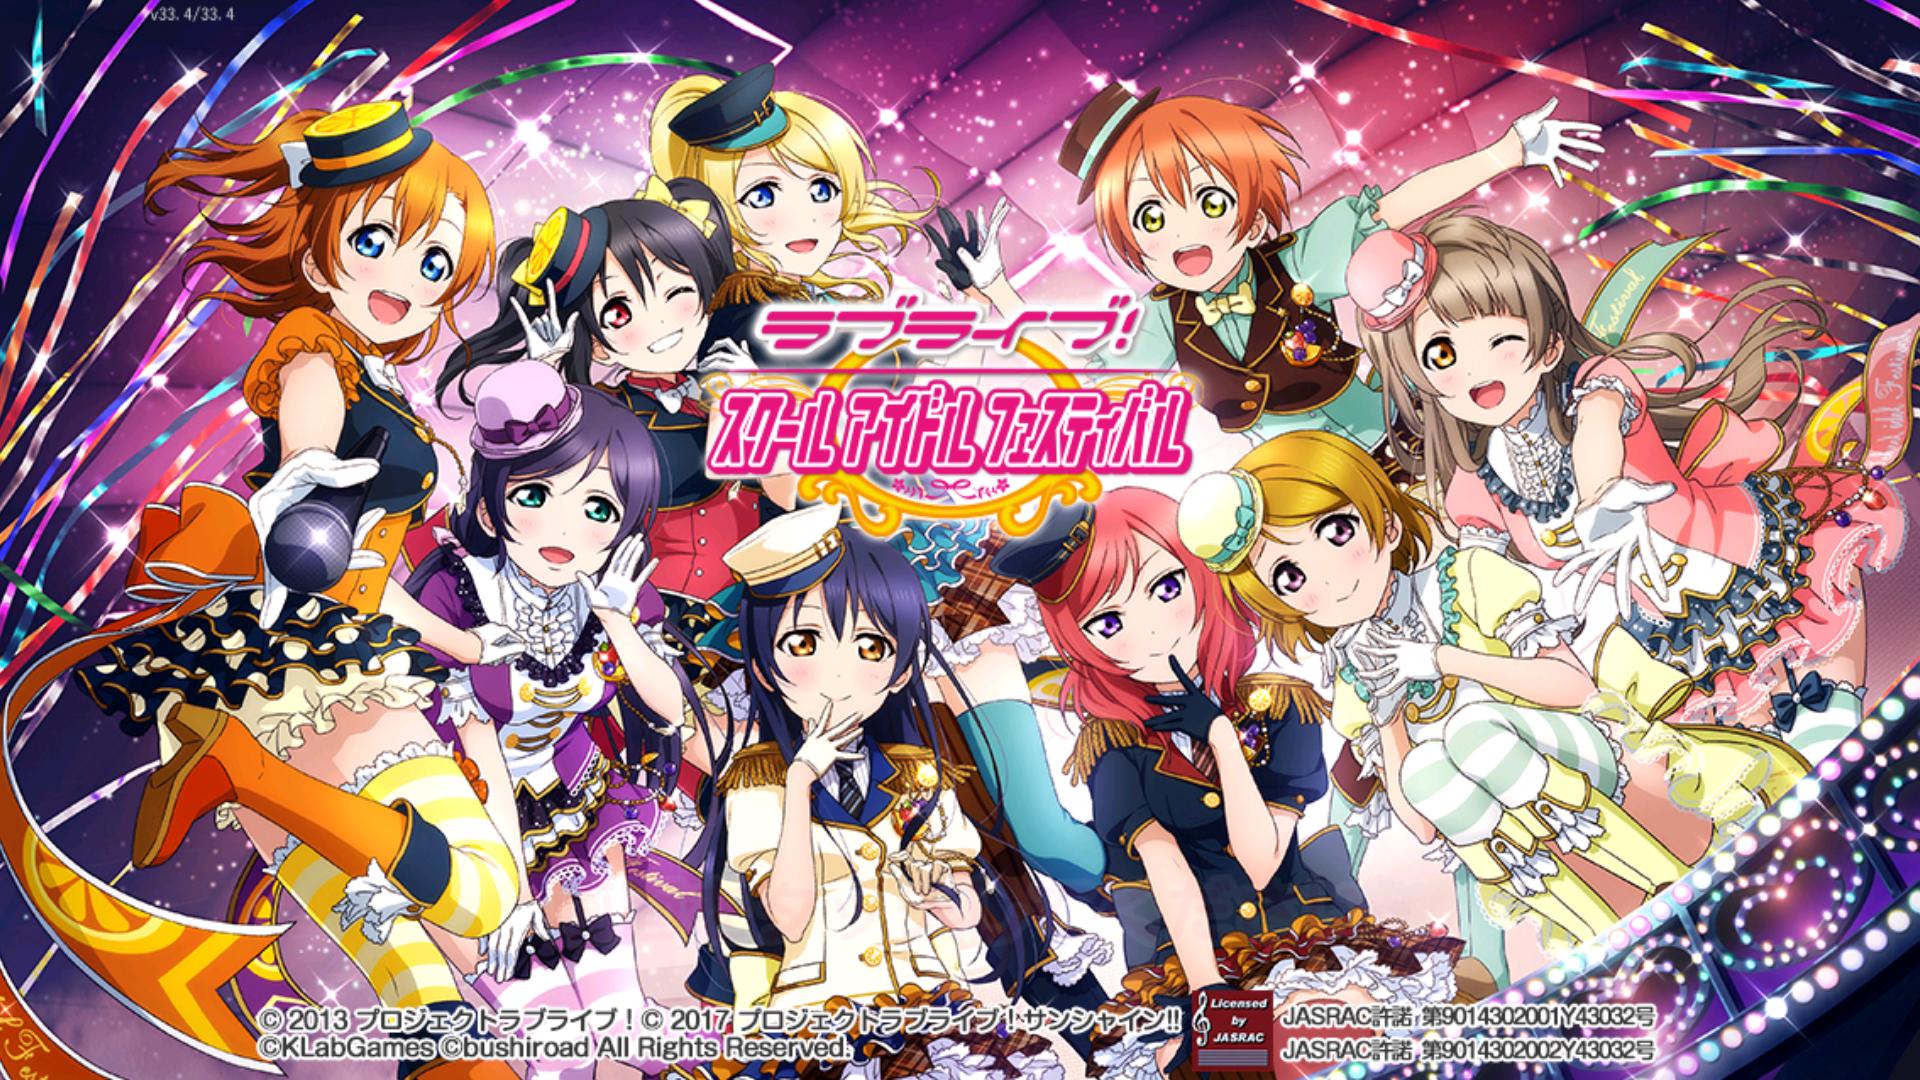 Love Live School Idol Festival Love Live Wiki Fandom Images, Photos, Reviews